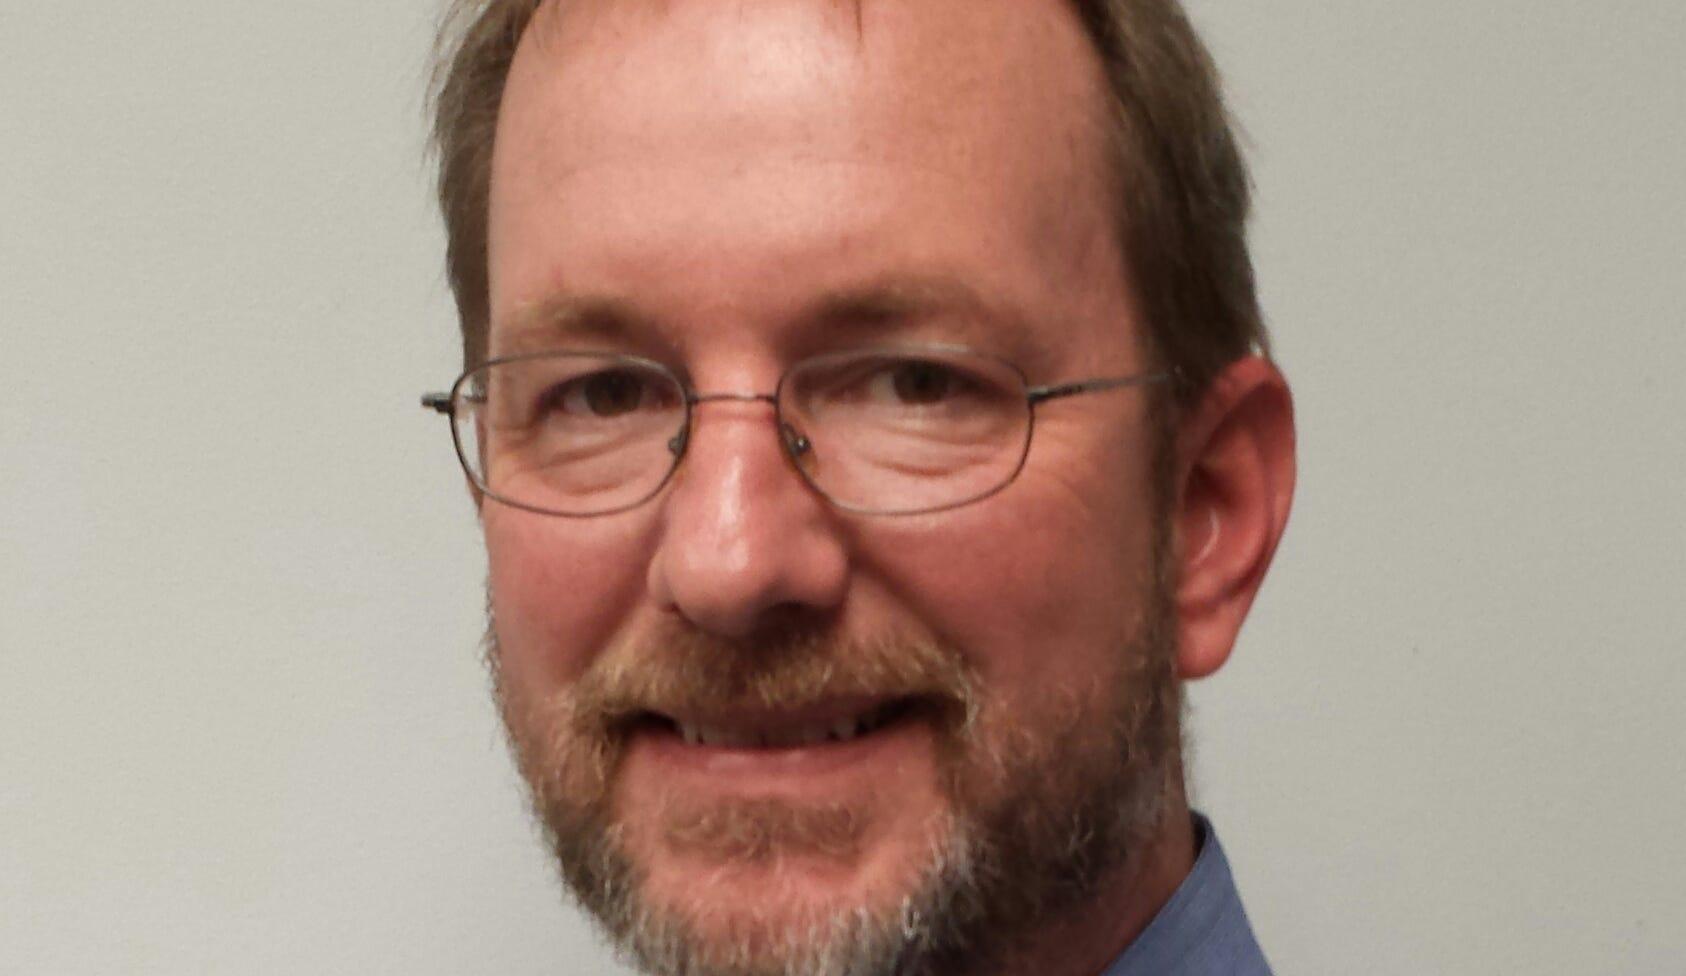 Mike Detmer calls out Paul Junge